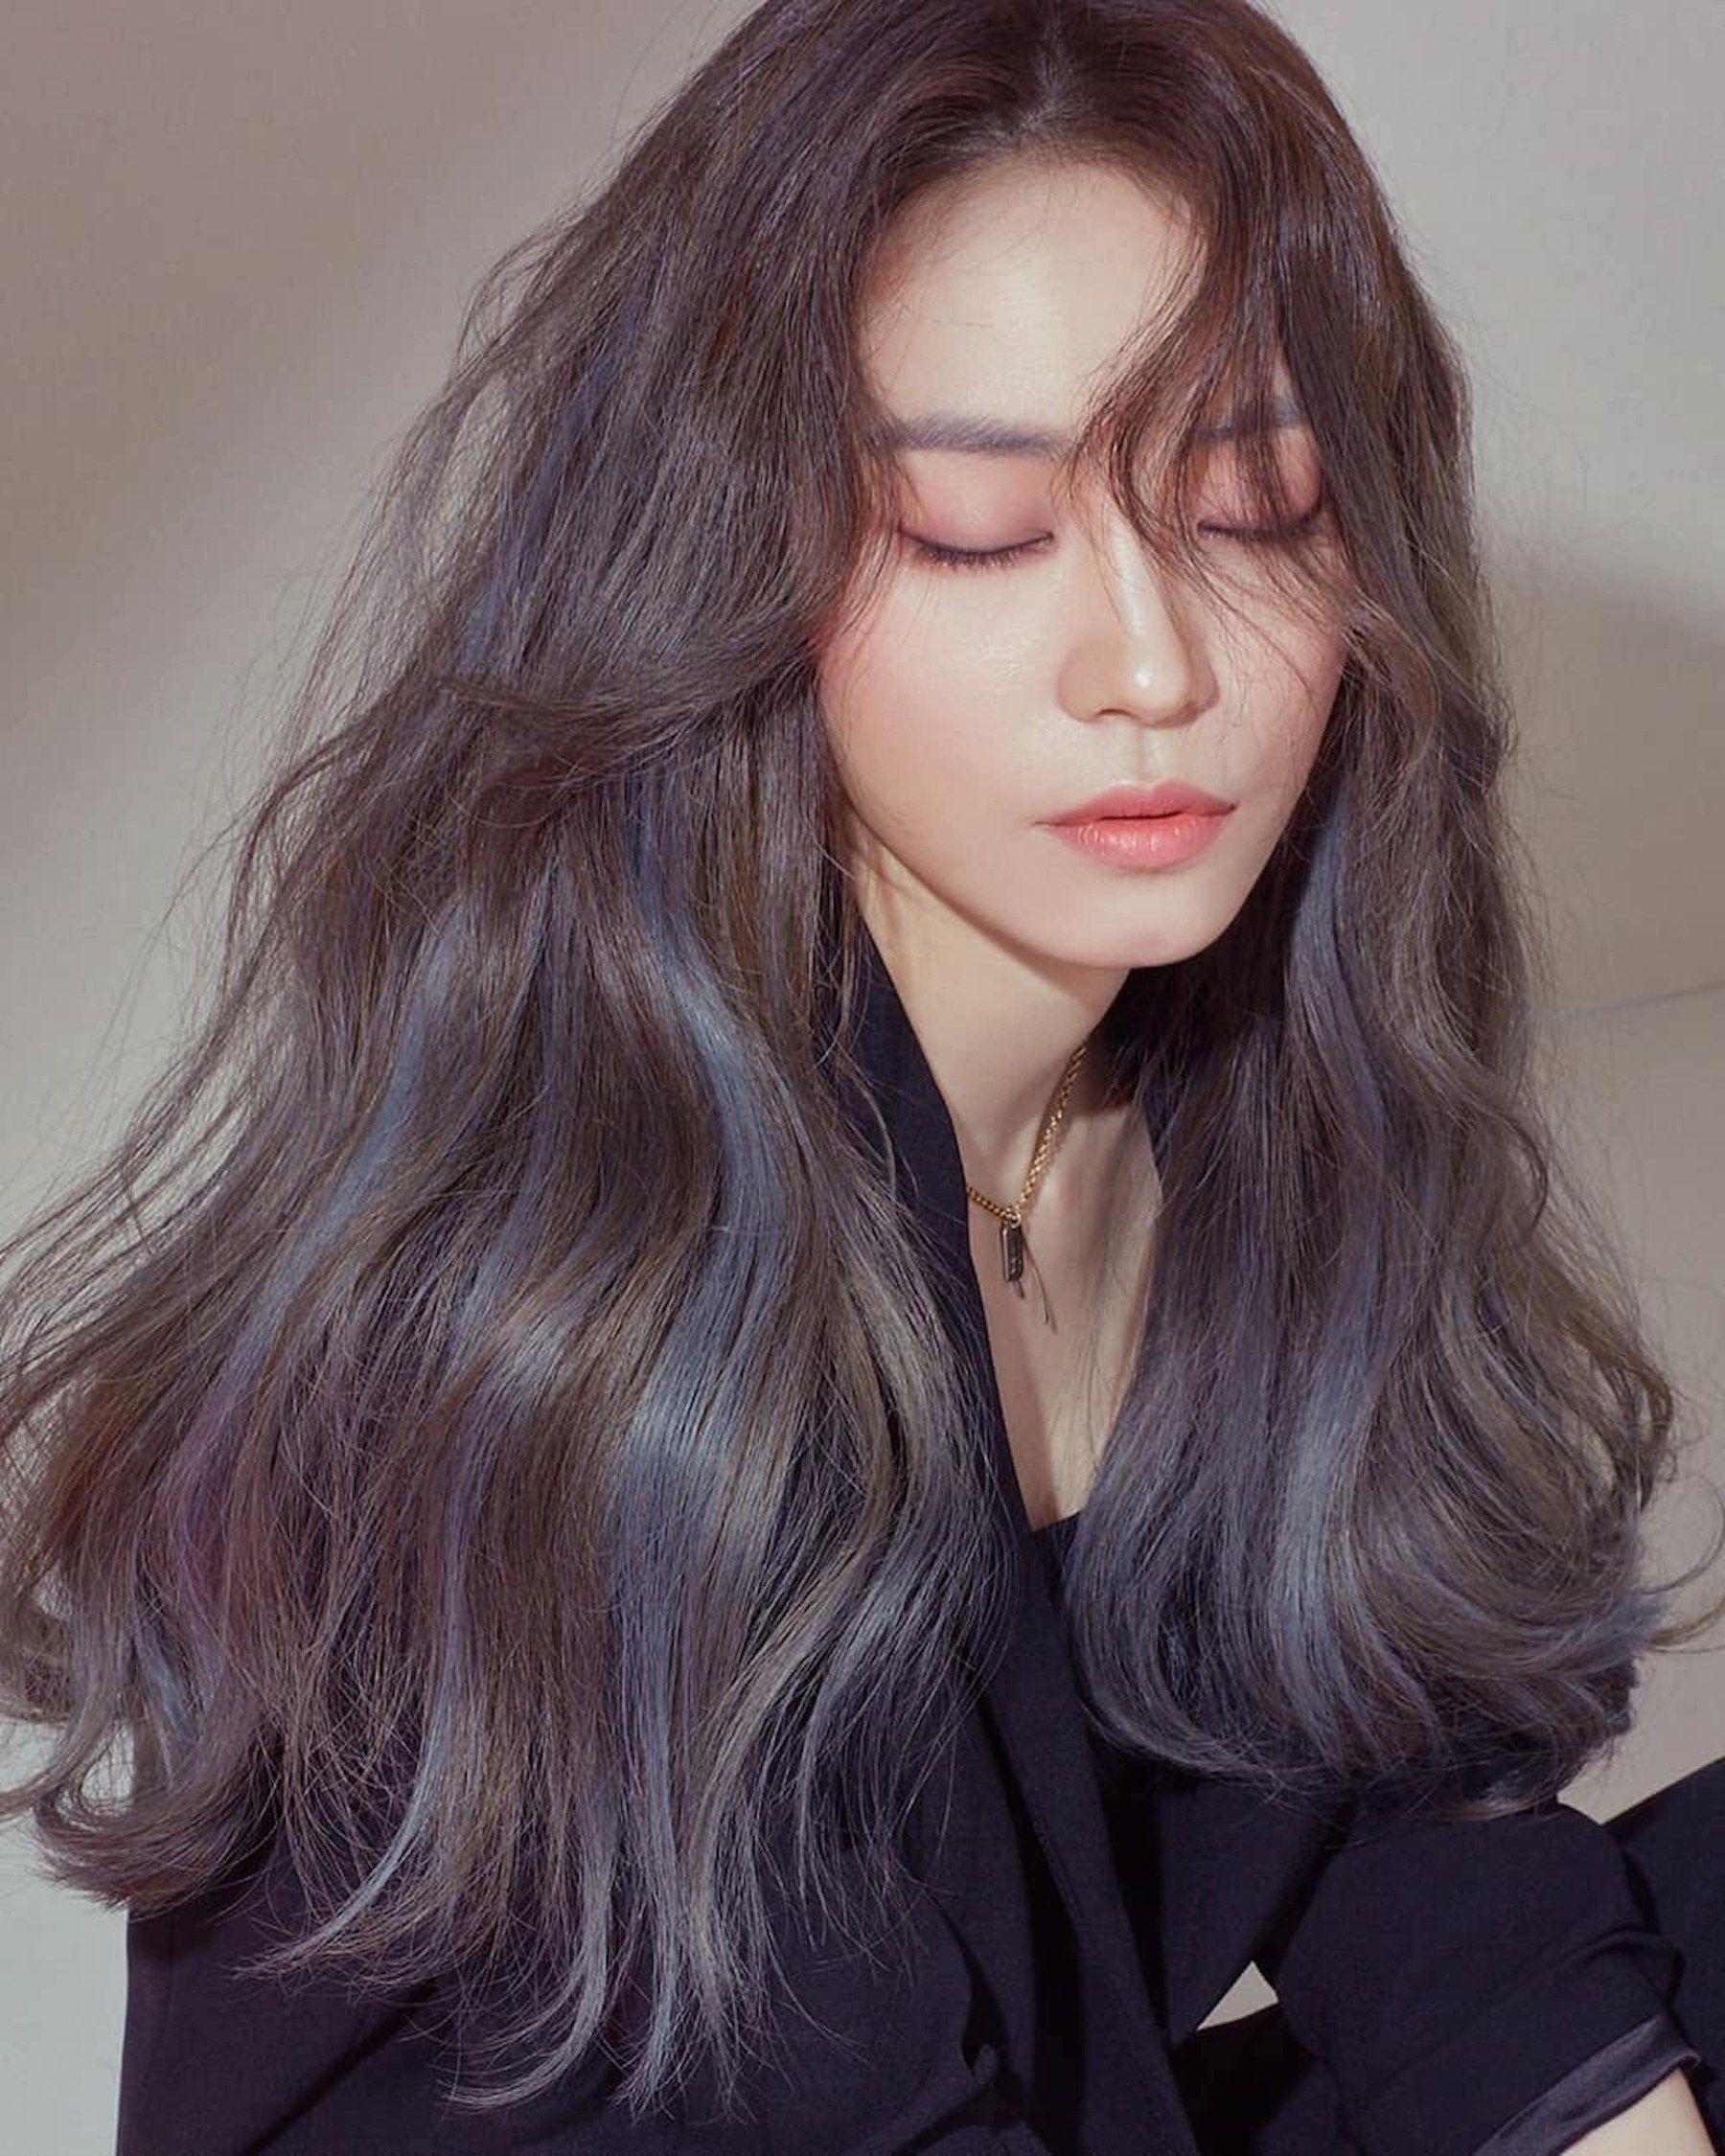 Hair Color Trends In 2020 Korean Hair Color Hair Color Asian Popular Hair Color